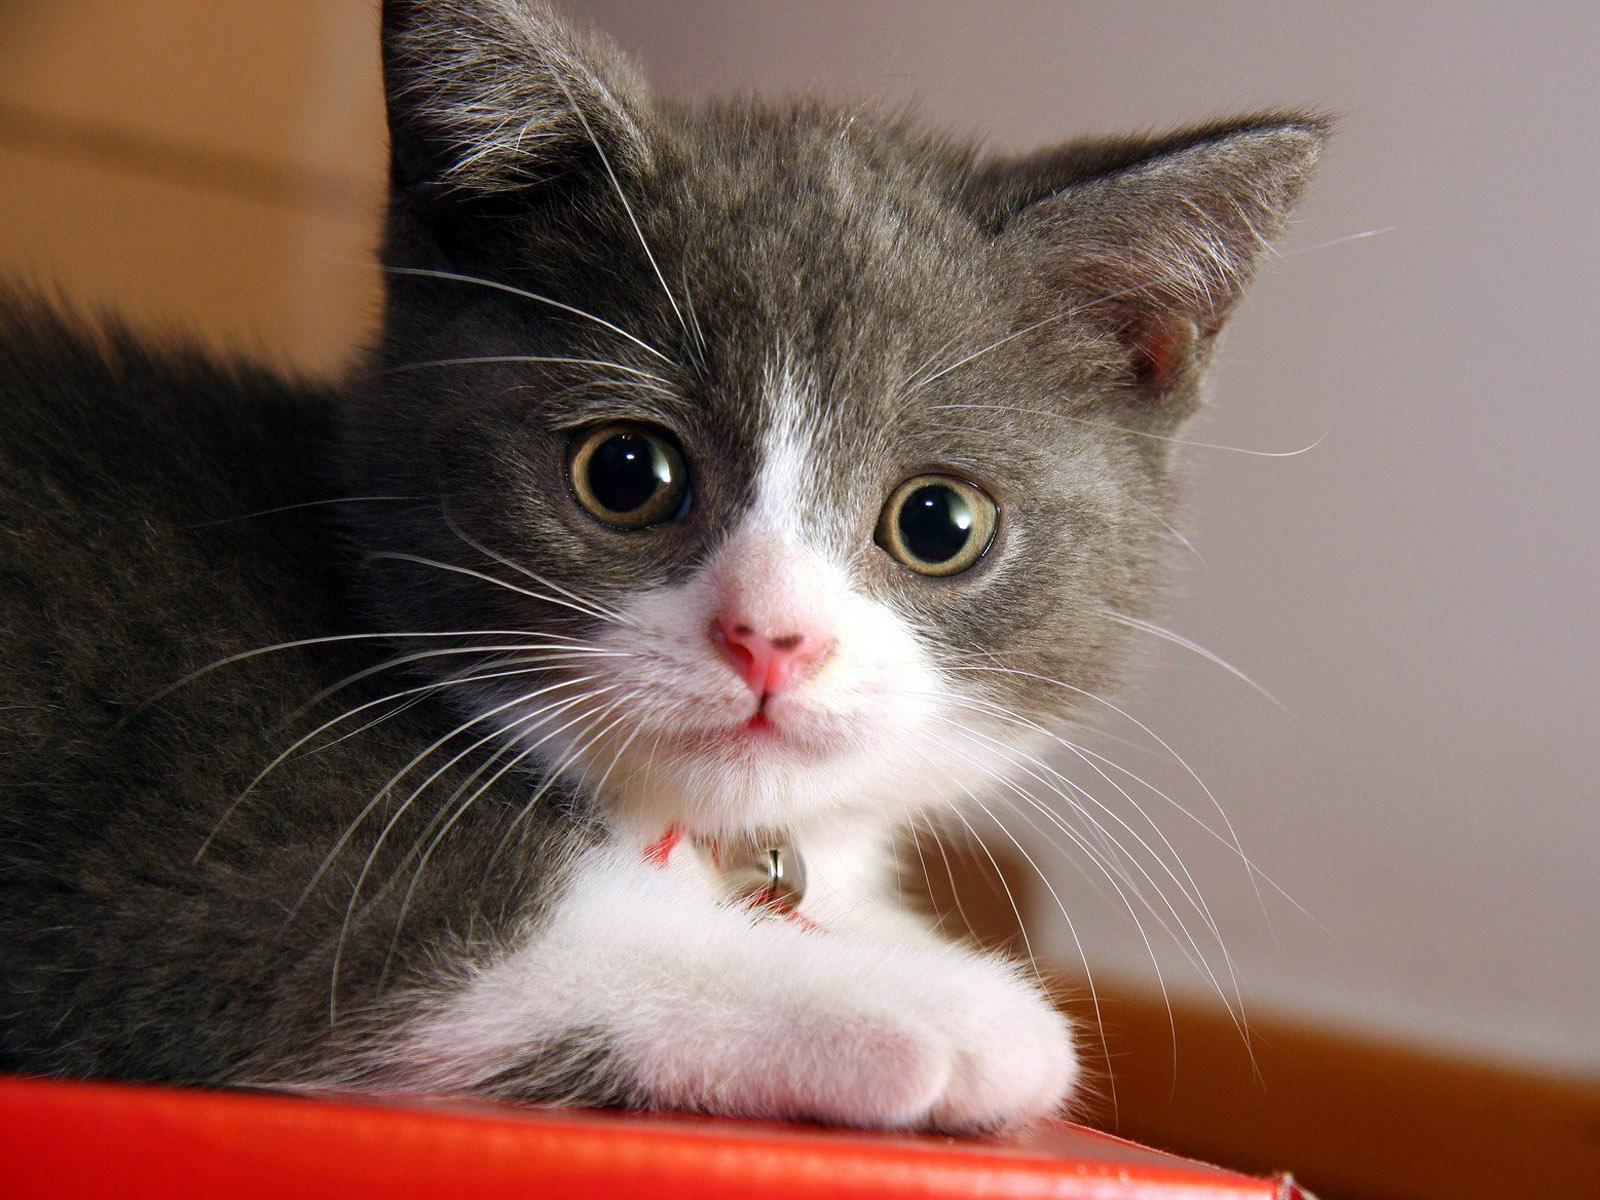 http://3.bp.blogspot.com/_N_mOB63qPaE/S1HgSpvRDBI/AAAAAAAANIA/WPEXLknb3Jg/s1600/Cat+-+Walls+-+4.jpg